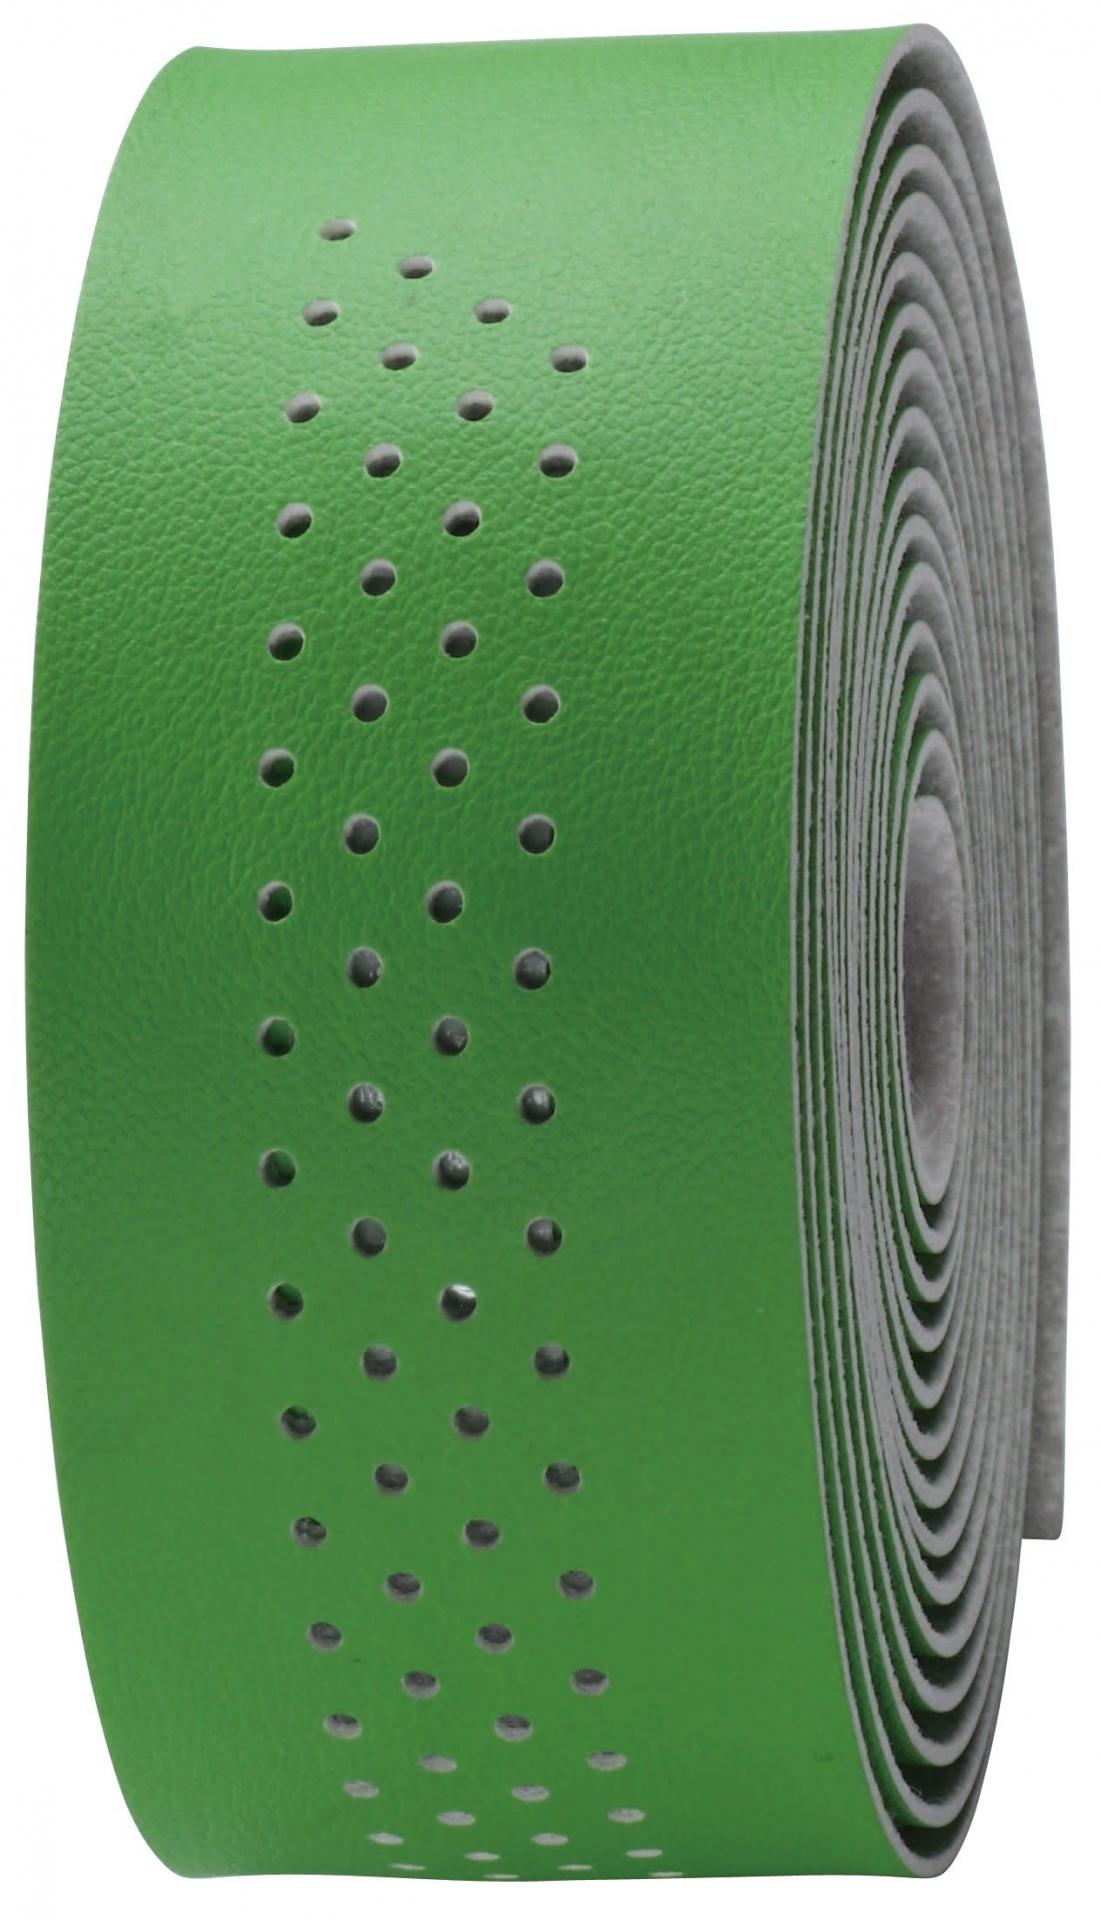 Ruban de cintre BBB SpeedRibbon (vert) - BHT-12